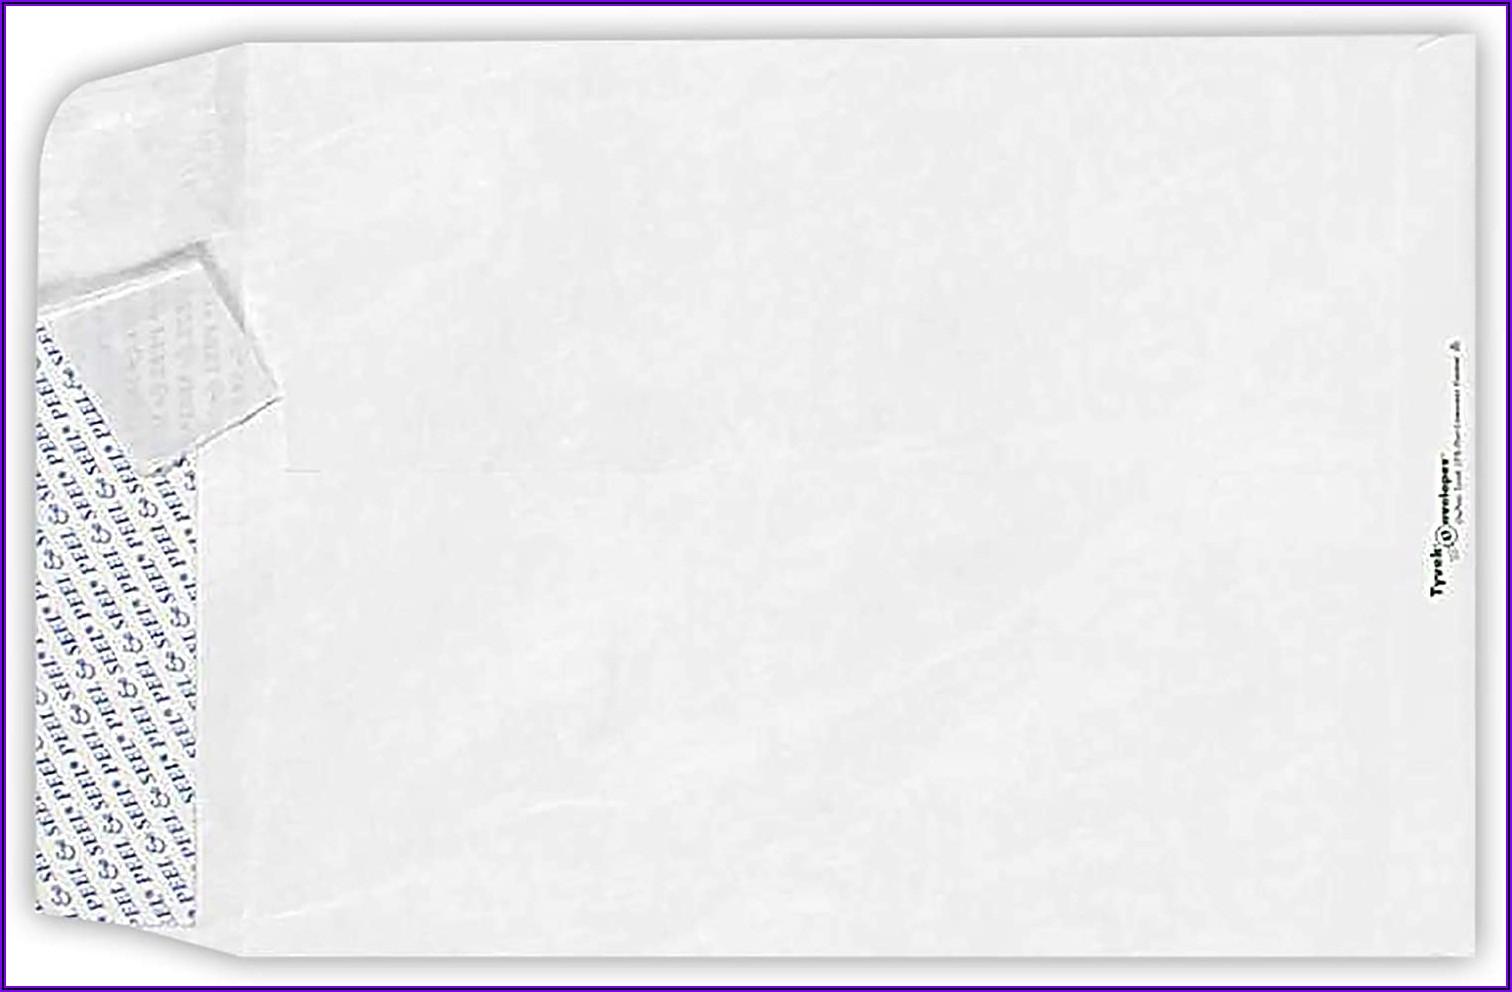 9 X 12 White Mailing Envelopes